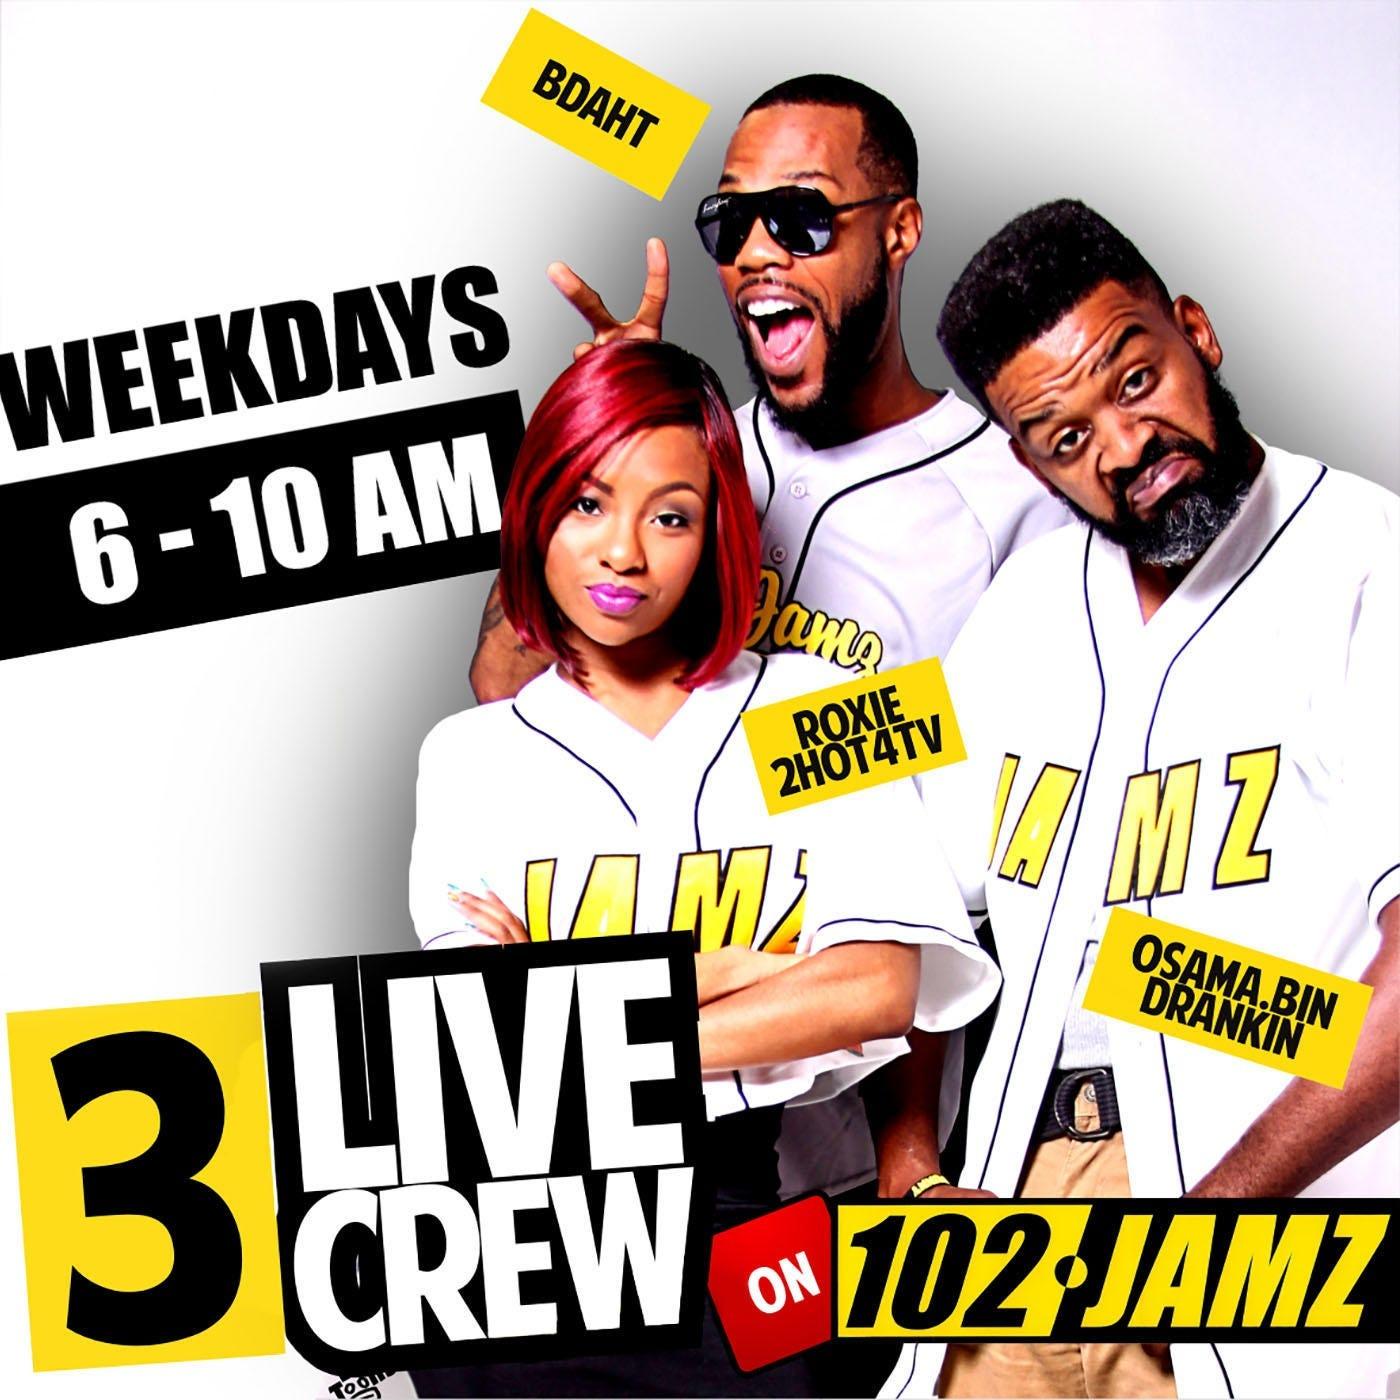 3 Live Crew Podcast